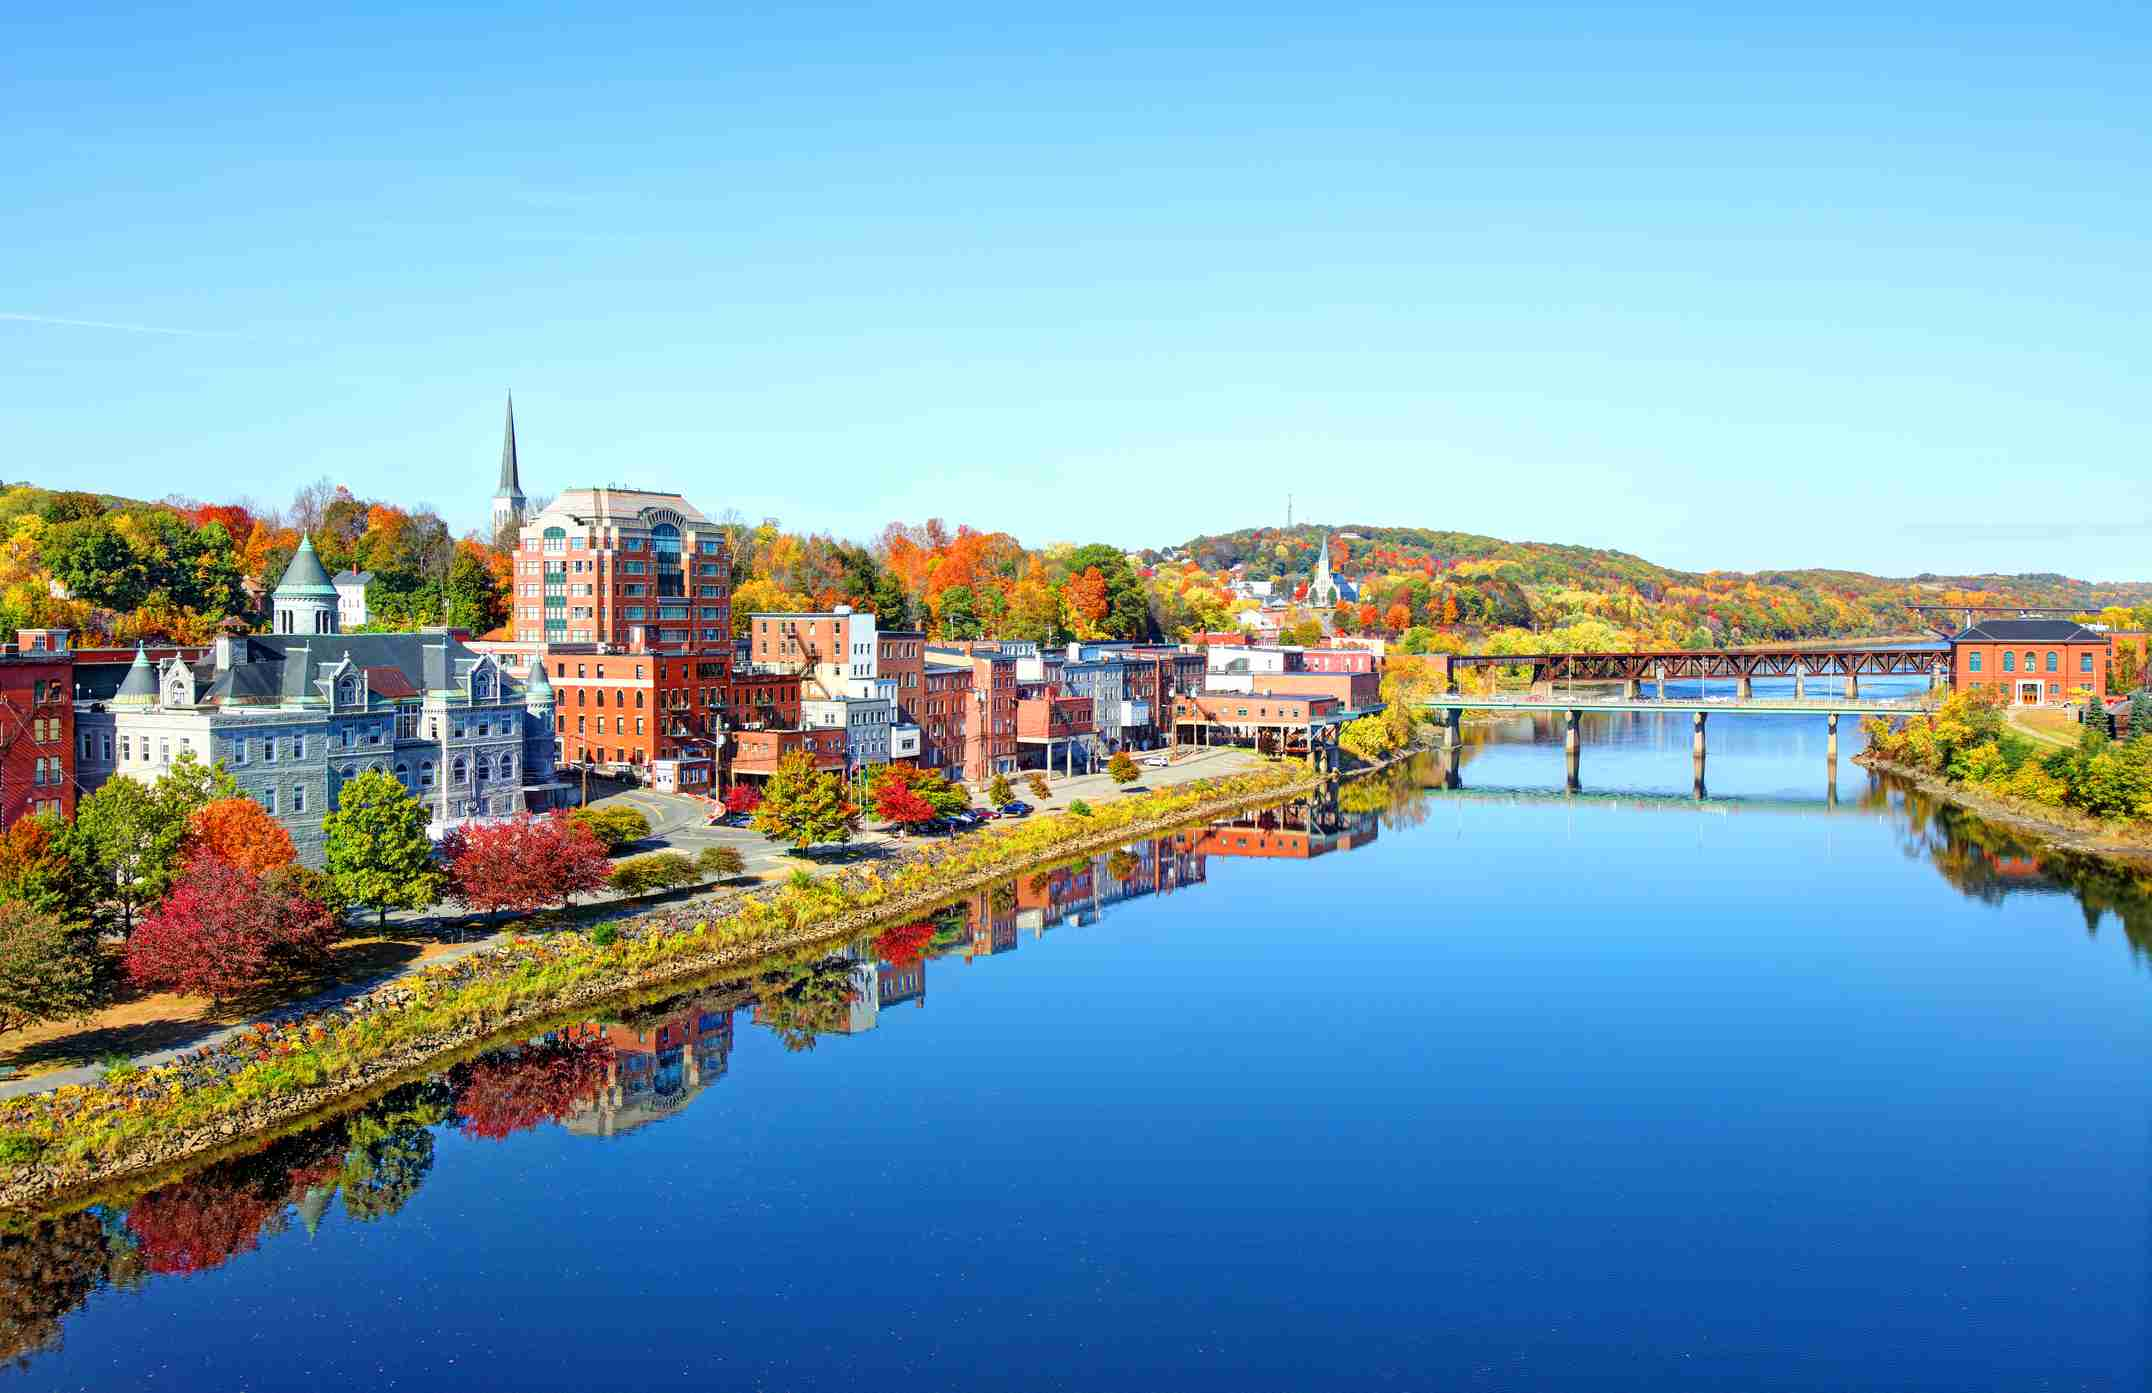 Augusta, Maine alongside the Kennebec River